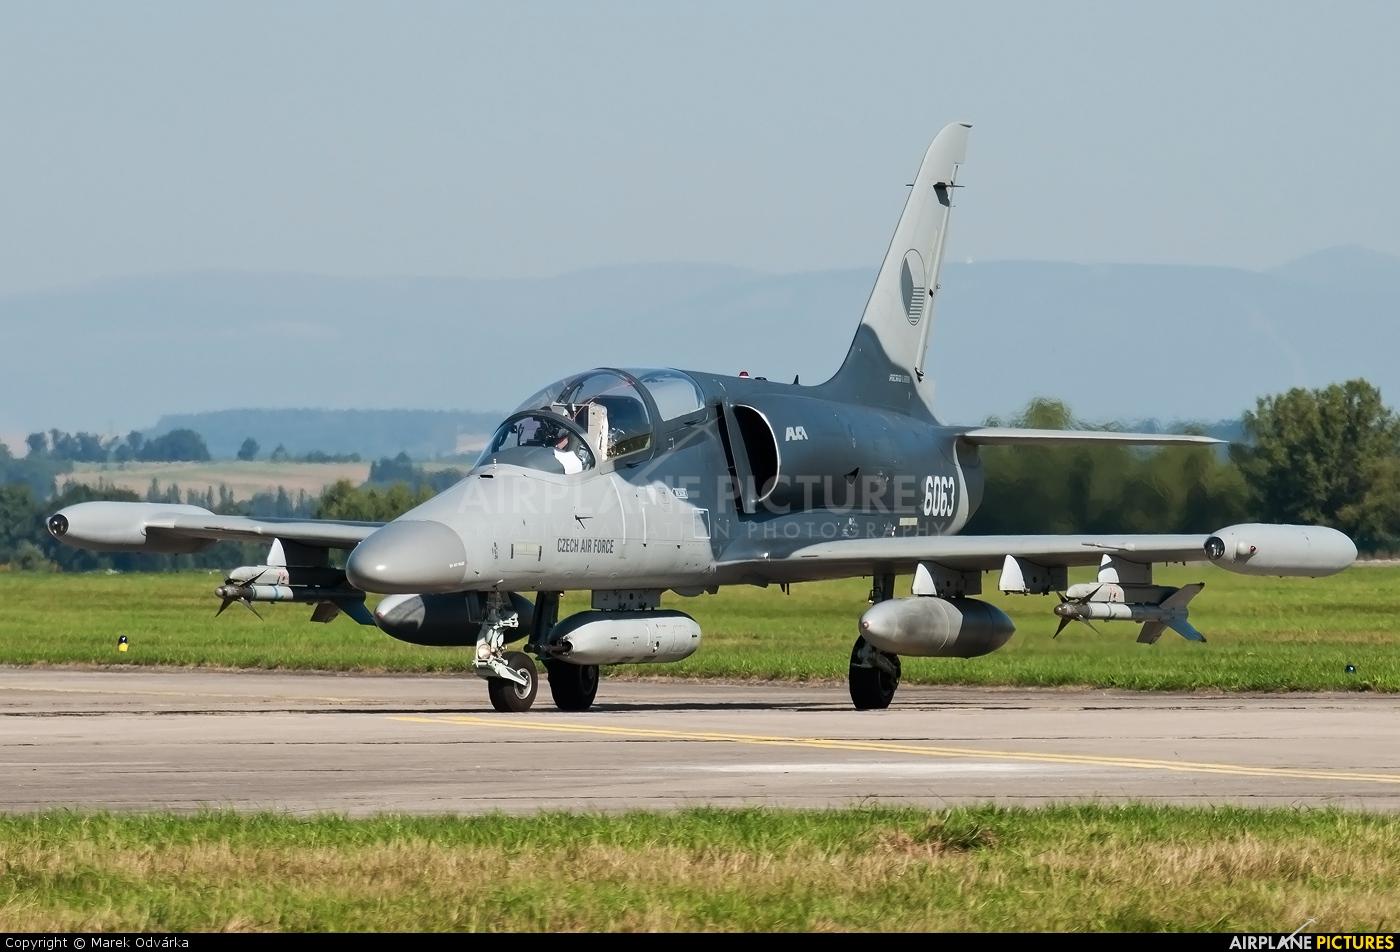 Czech - Air Force 6063 aircraft at Hradec Králové